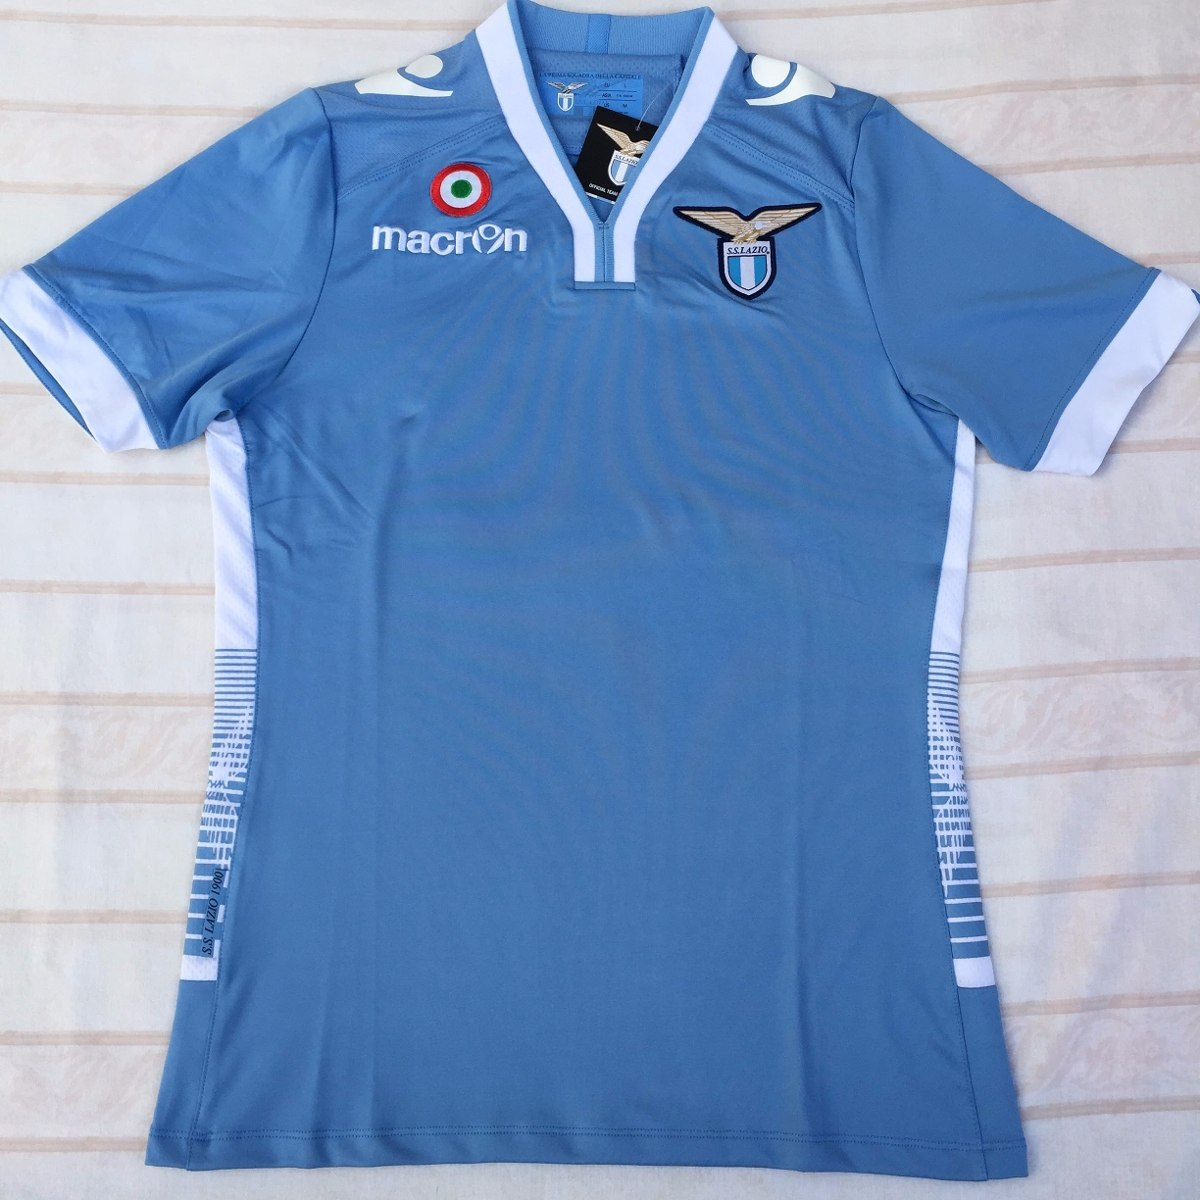 07d244a507 Camisa Macron Lazio Home 13 14 G Jogador Original Fn1608 - R  1.199 ...